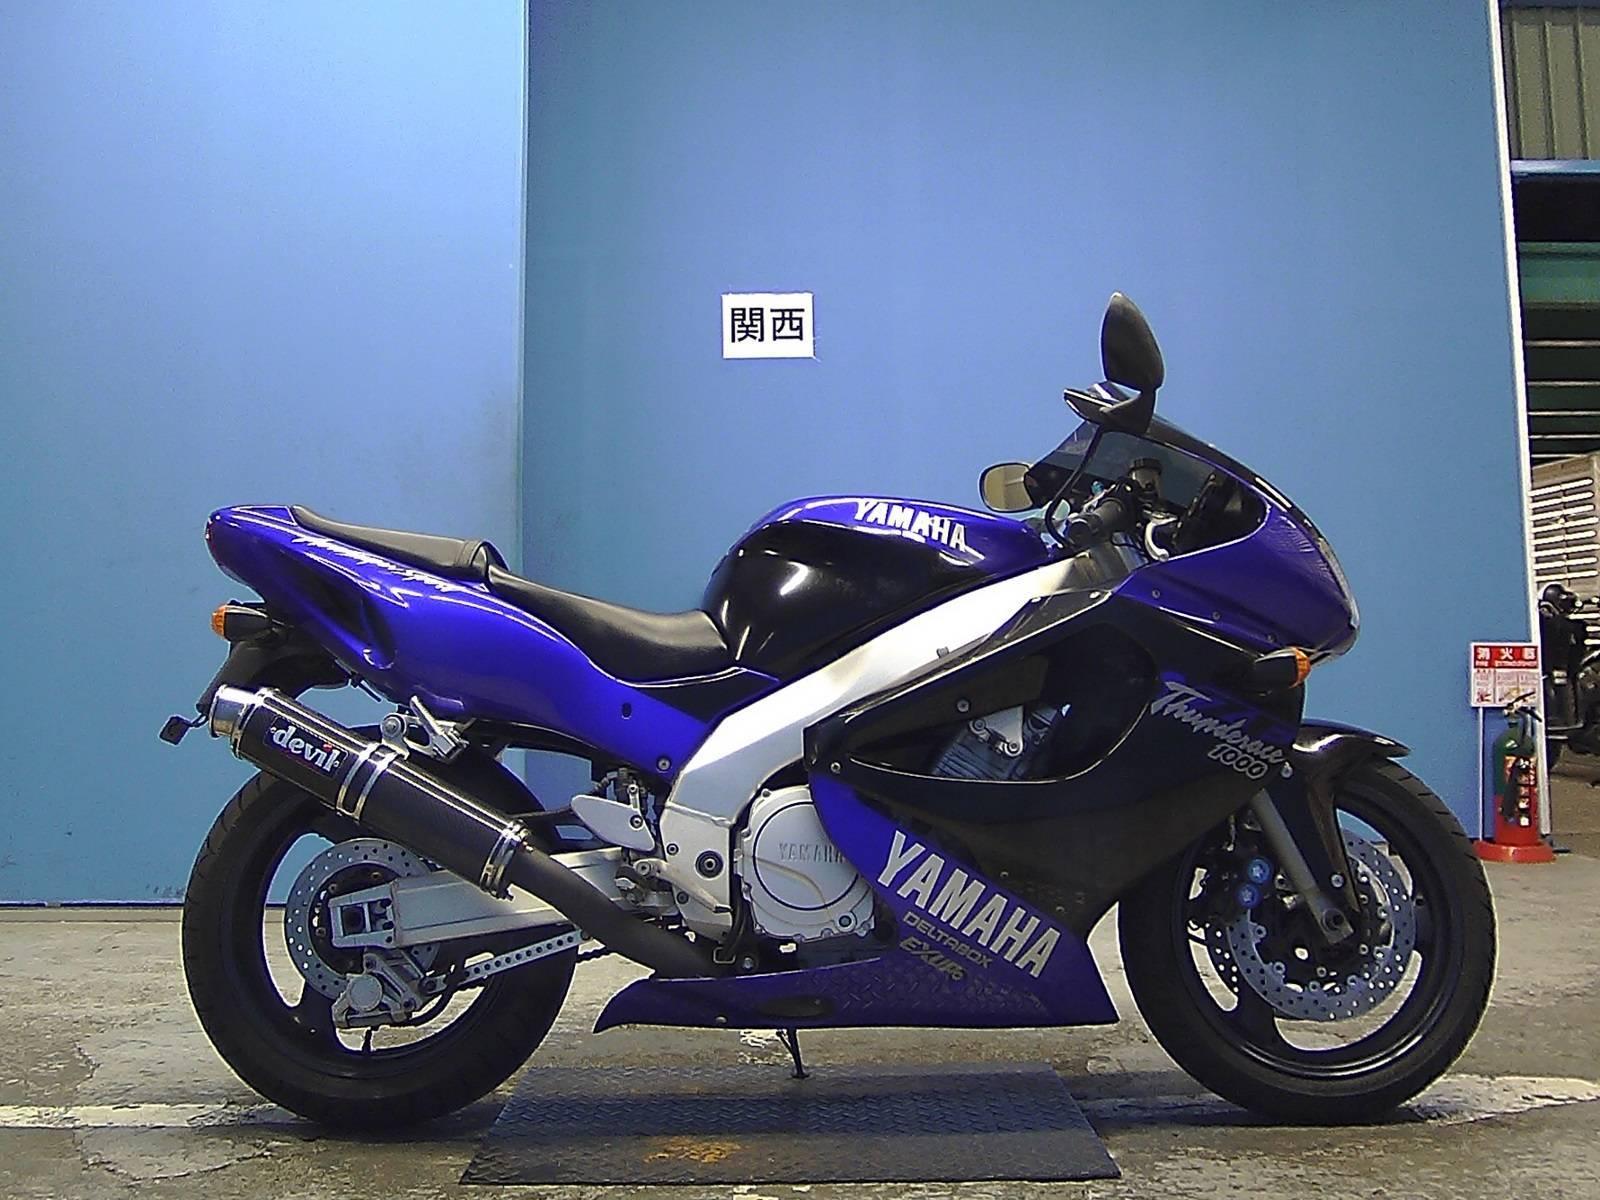 Yamaha YZF1000R Thunderace